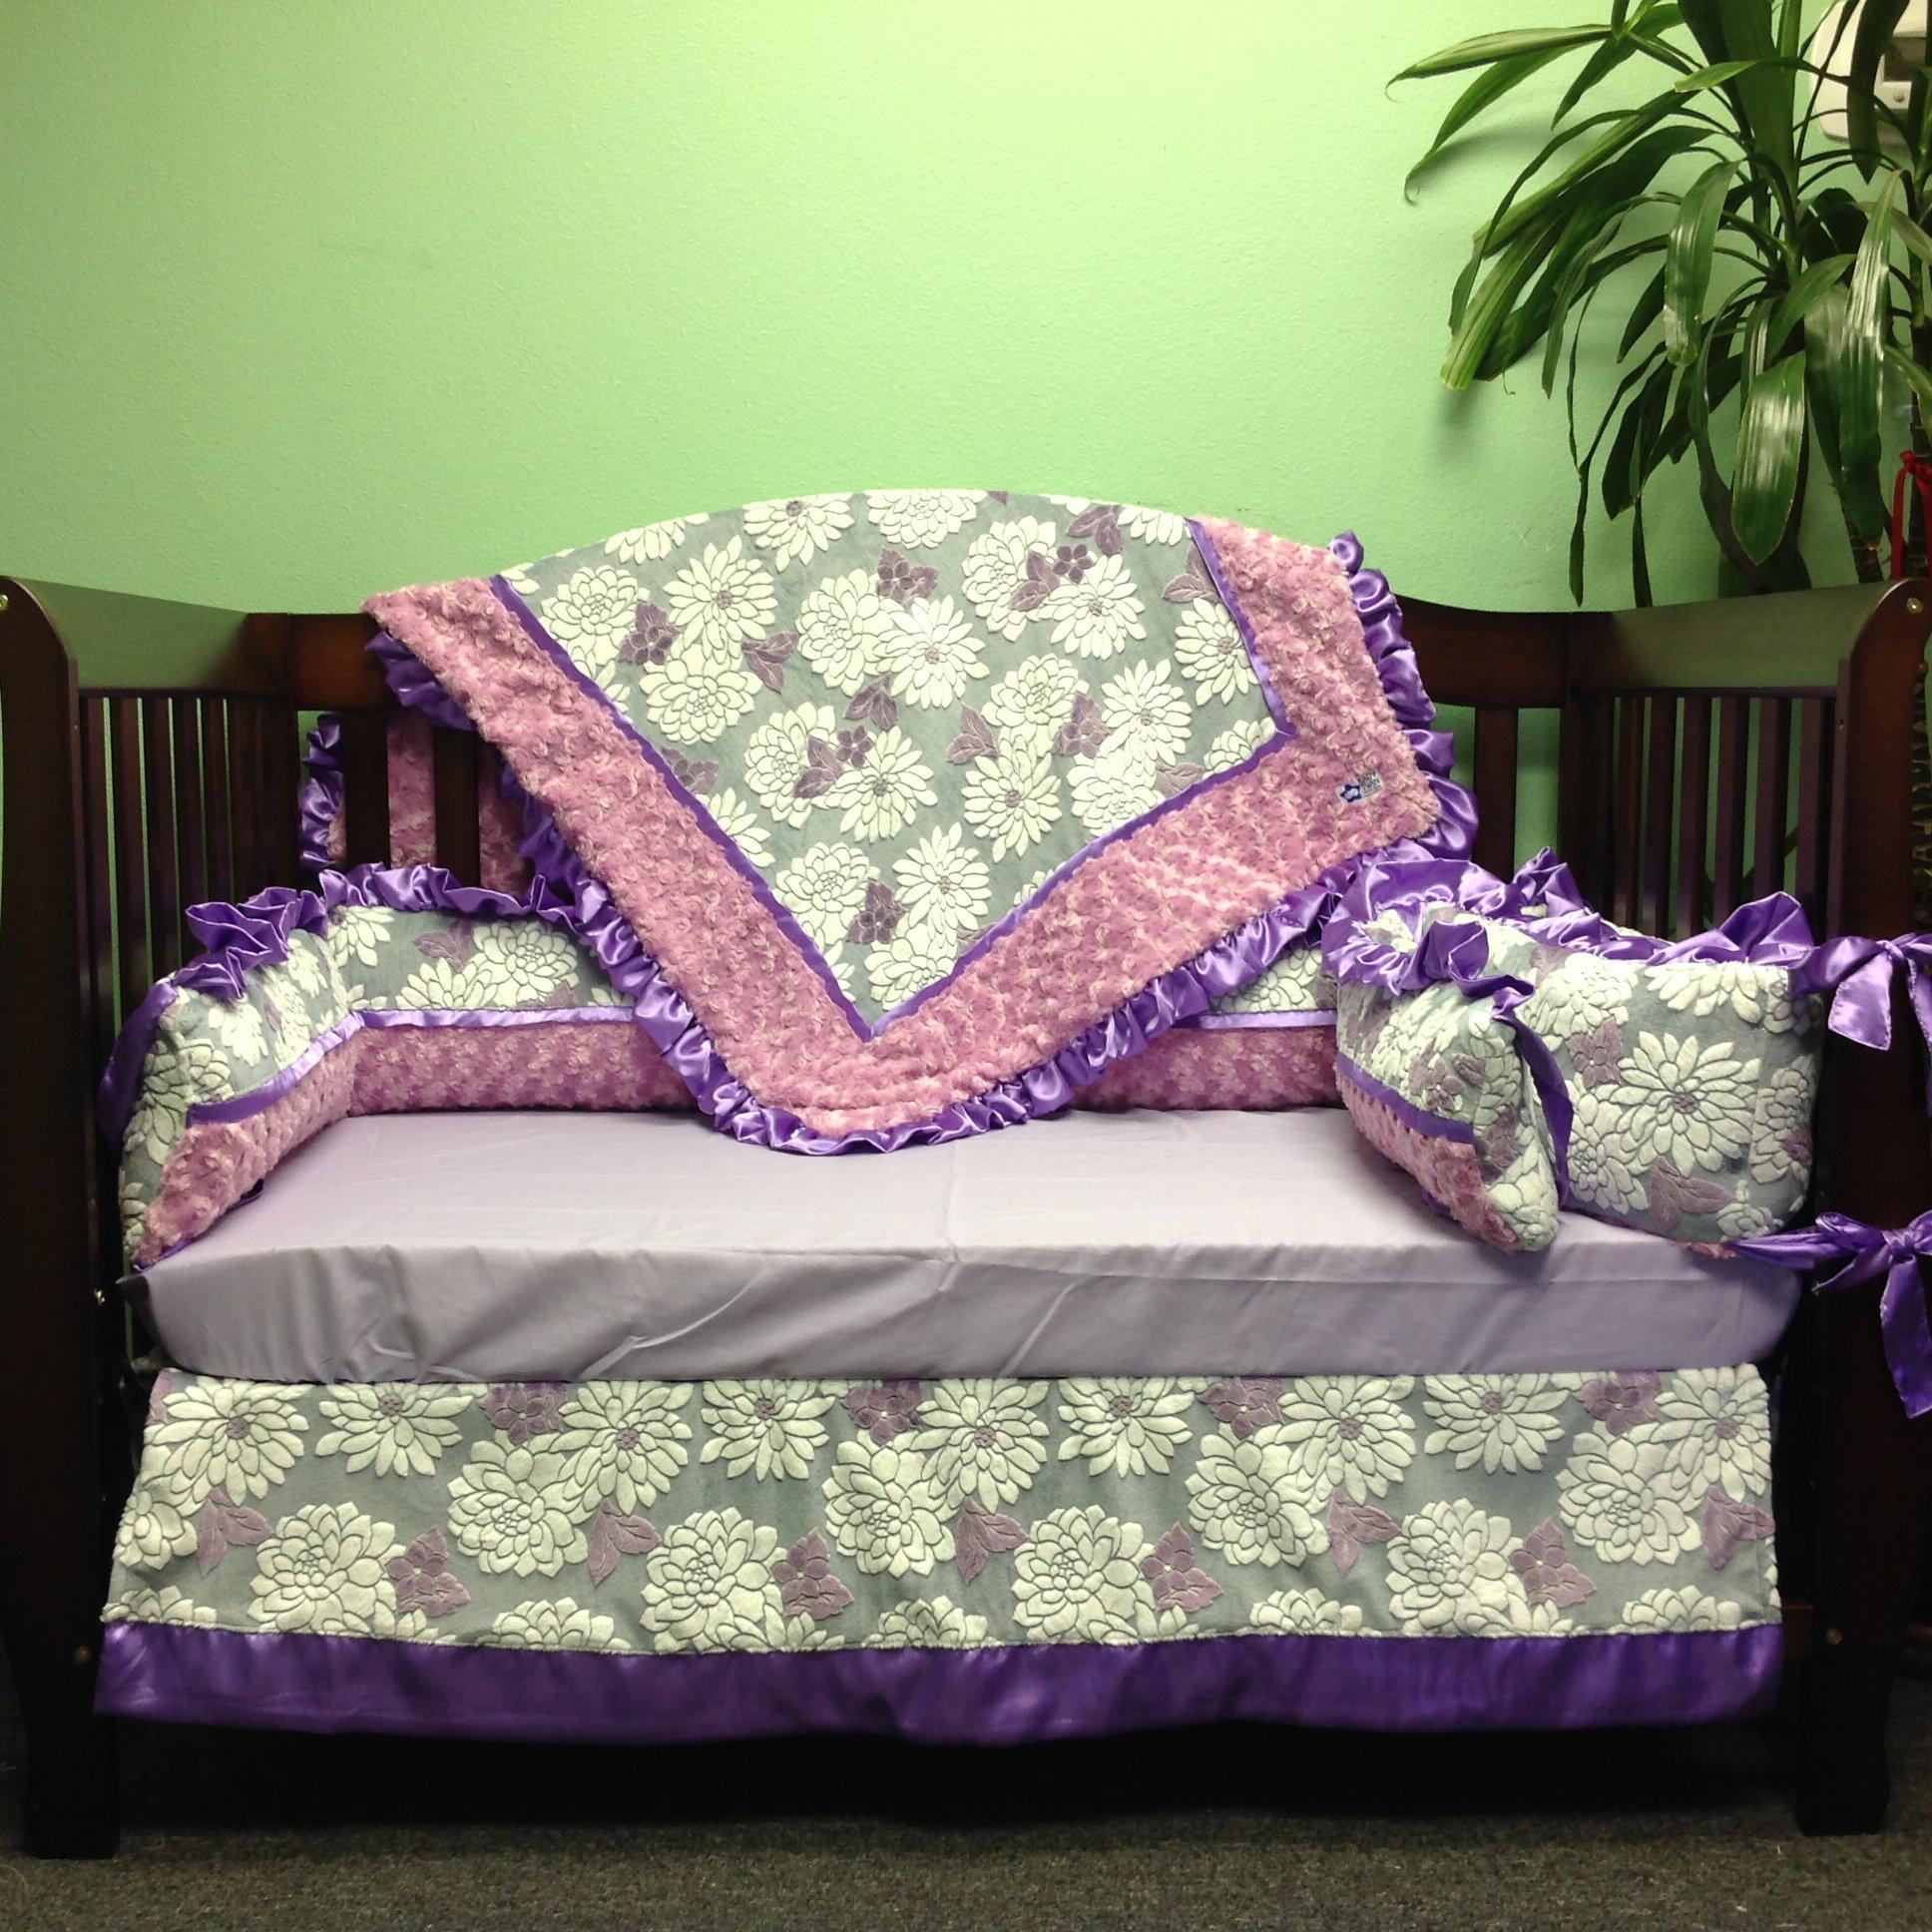 Bedding Set Regular Size ''Flowers''